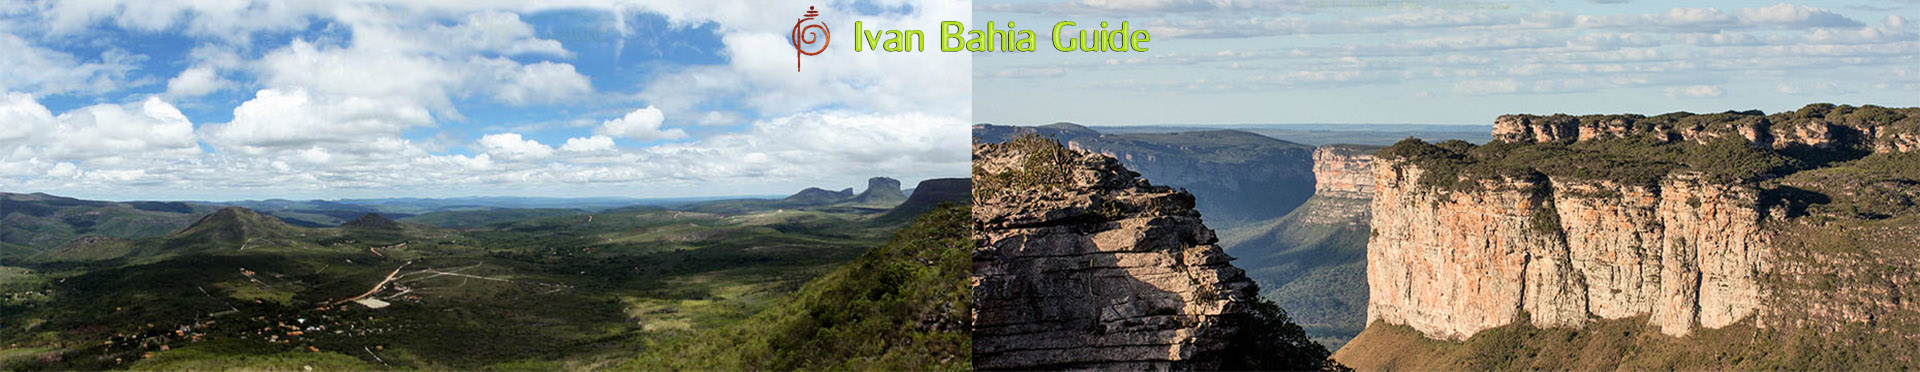 Ivan Bahia tour-guide / hiking in Chapada Diamantina National Park (aka 'the Brazilian Grand Canyon') / #ibtg #ibg #ivanbahiaguide #ivanbahiatravelguide #zenturturismo #ivanchapadadiamantinaguide #valedopati #patyvalley #pati #viapati #valecapao #ivanchapadaguide #chapadadiamantinatransfer #chapadatrekking #chapadaroots #chapadasoul #lencoisbahia #chapadadiamantinatrekking #ivanchapadadiamantinaguide  #chapadadiamantinaguide  #guidechapadadiamantina #lencois #lençois #chapadaadventuredaniel #diamondmountains #zentur # #guiachapadadiamantina #chapadaaventure #discoverchapada #chapadadiamond #chapadasoul #diamantinatrip  #tripadvisor #bahiametisse, #fernandobingre, #ivansalvadorbahia #salvadorbahiaTravel #toursbylocals #fotosbahia #bahiafotos #chapadadiamantinanationalpark #yourtoursbrazil #maurotours #bahiatopturismo #bahiapremium #maisbahiaturismo #fernandobingretourguide #cassiturismo